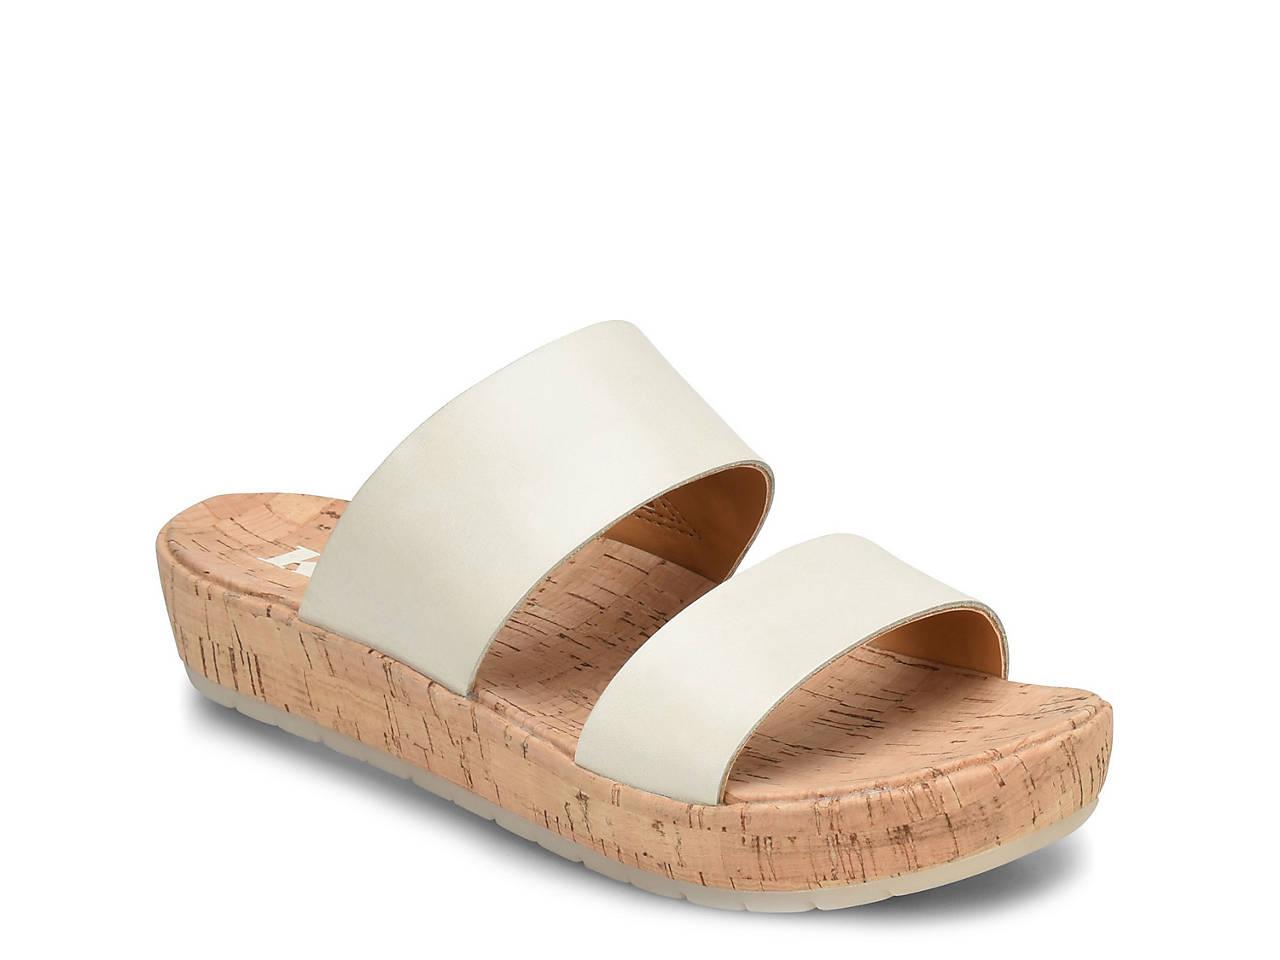 70a0280ba174 Korks Tidal Platform Sandal Women s Shoes